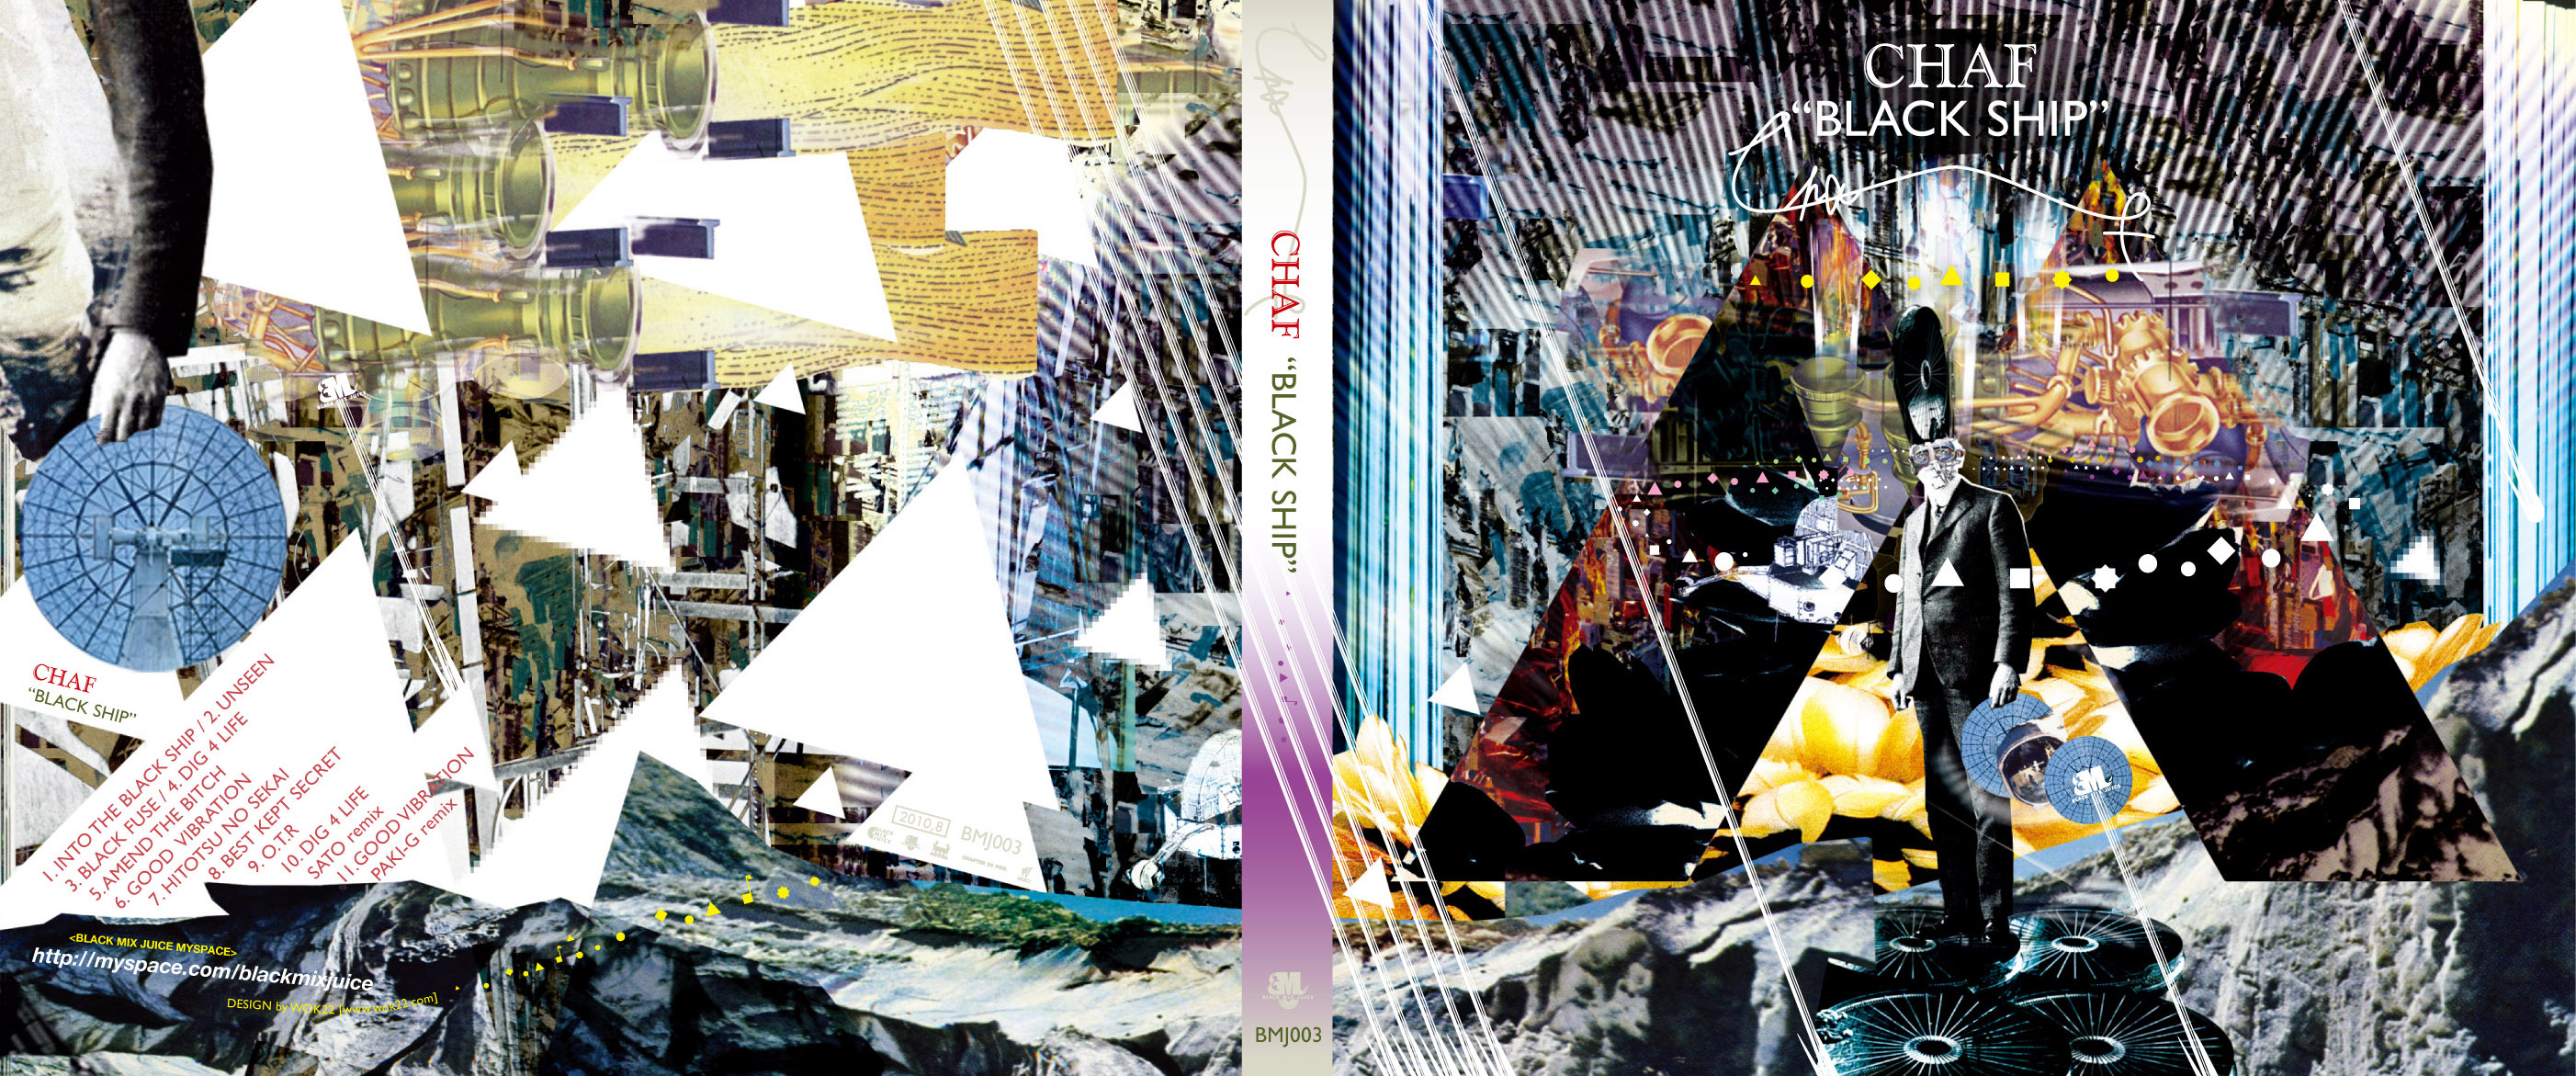 2010.7.15.CHAF_CD